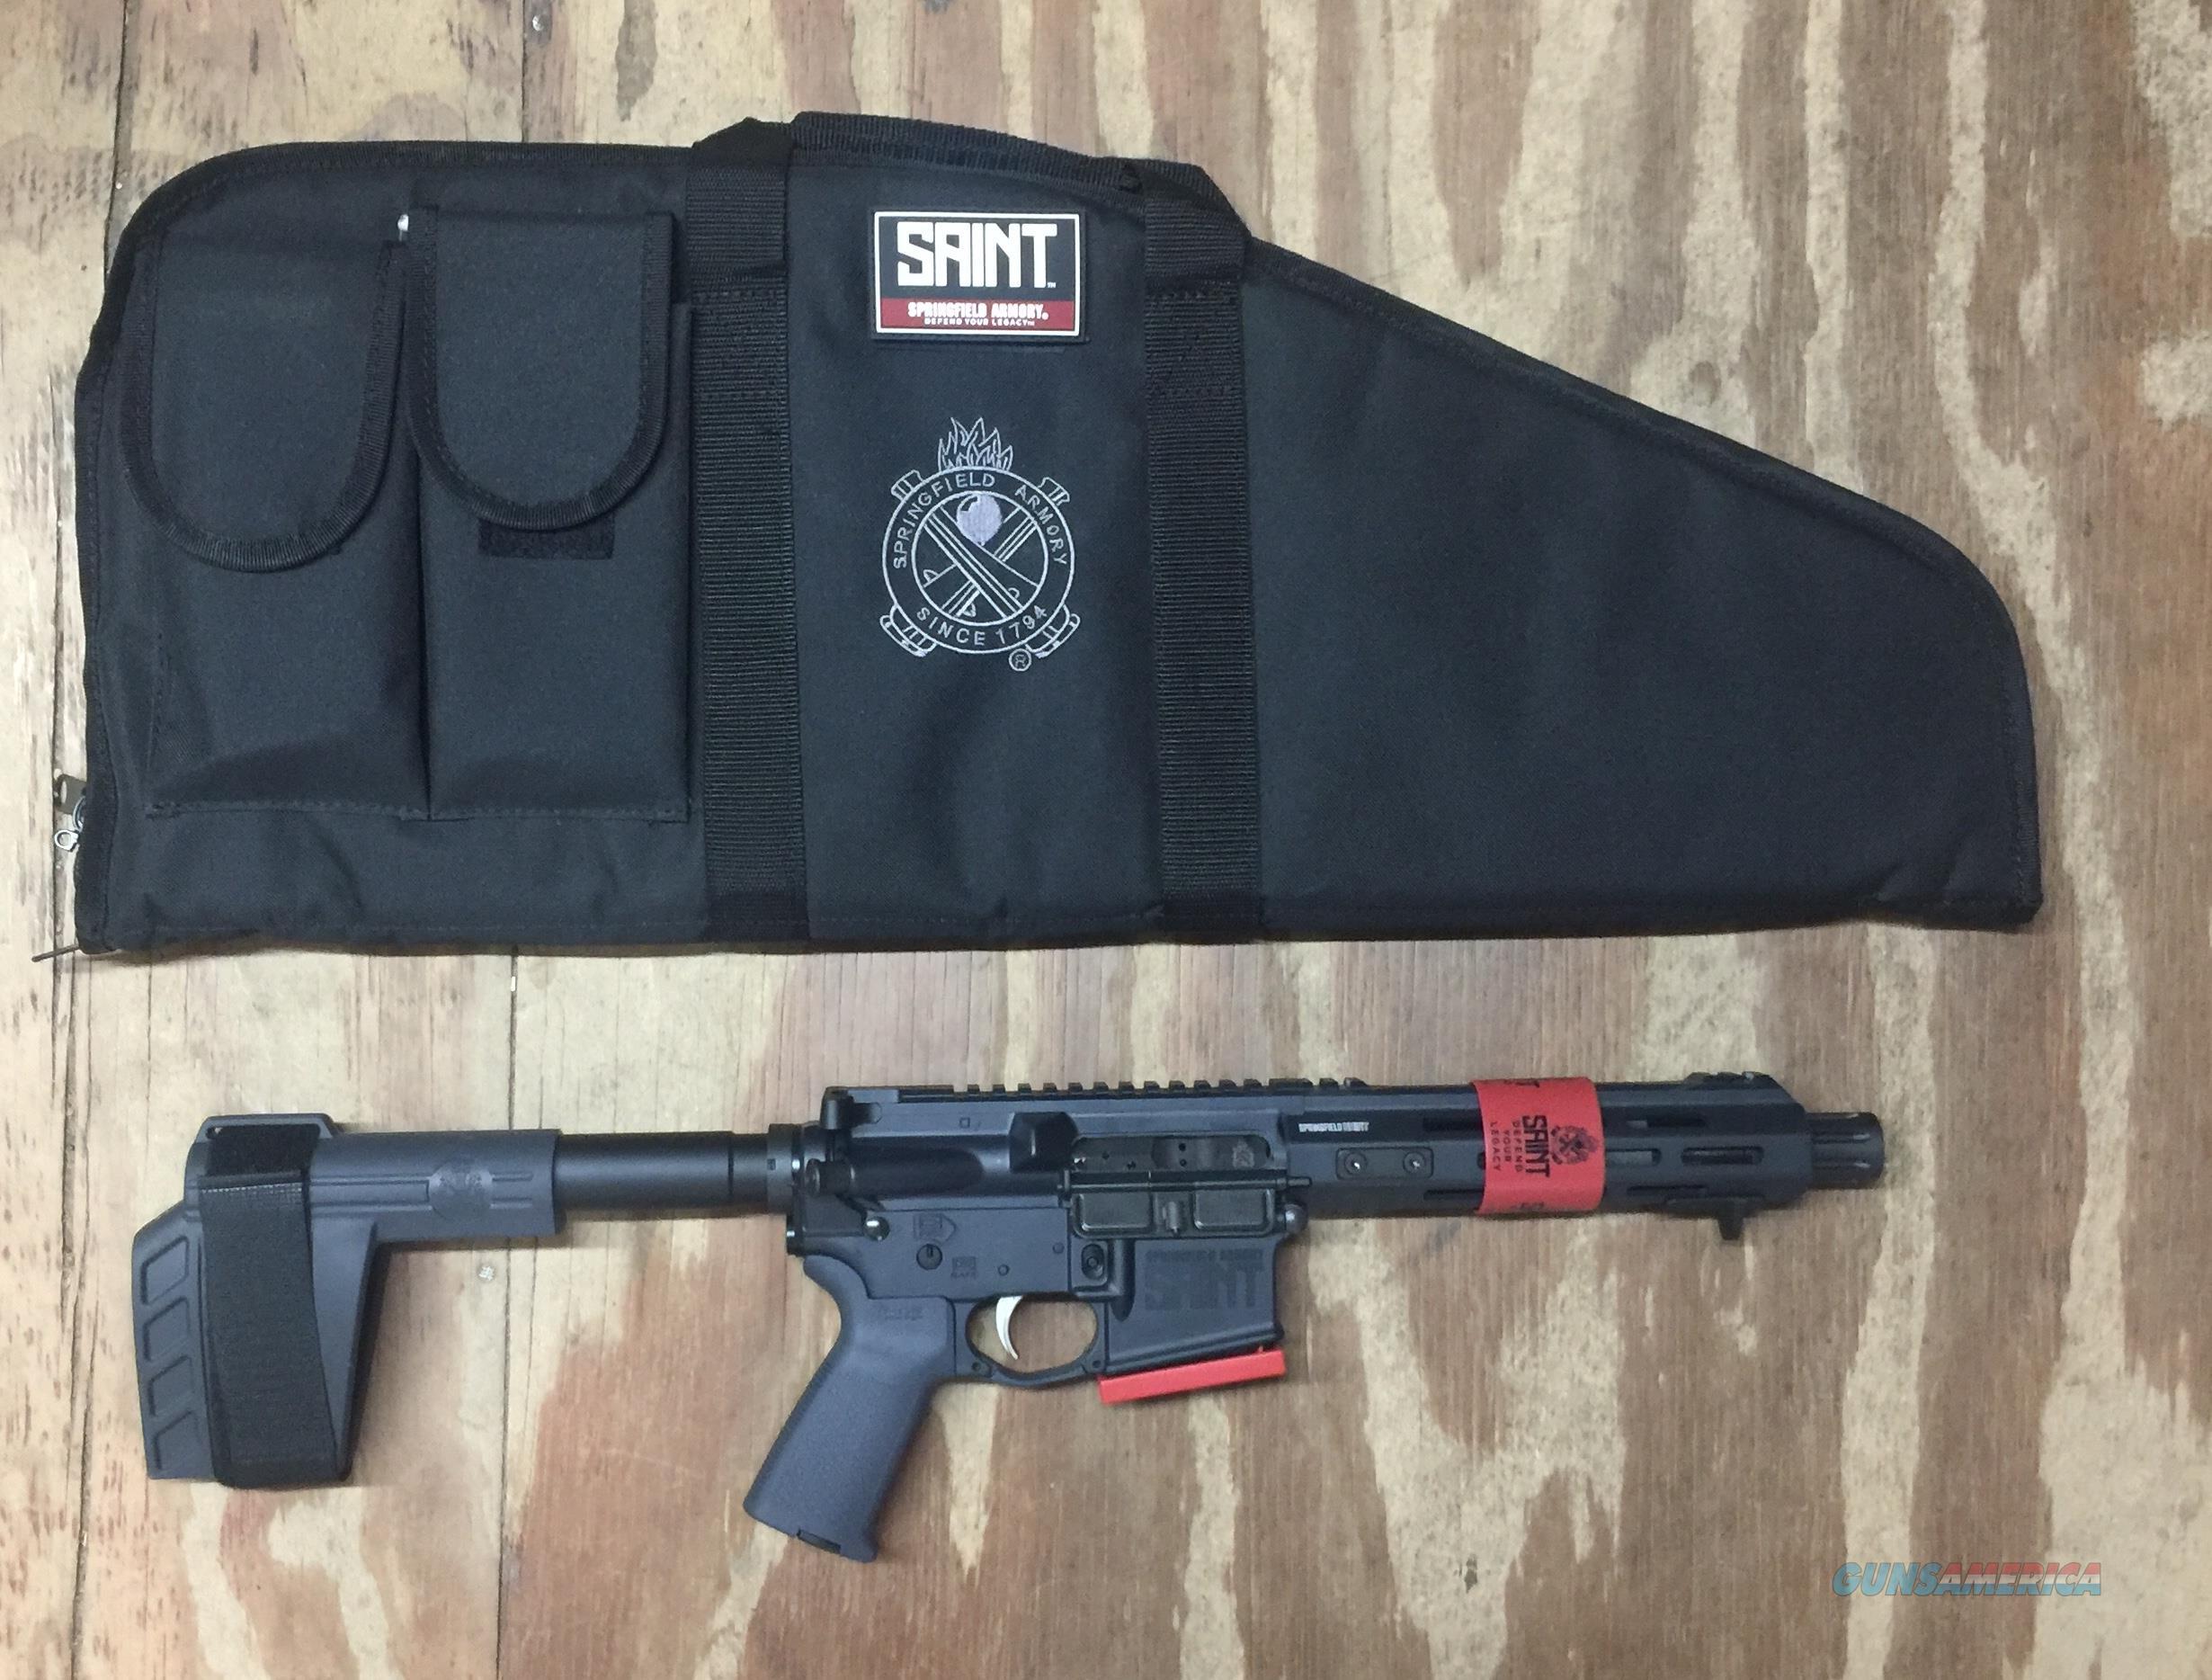 Springfield Armory ST975556GRY SAINT Pistol 5.56 x 45 mm NATO  Guns > Pistols > Springfield Armory Pistols > SAINT Pistol